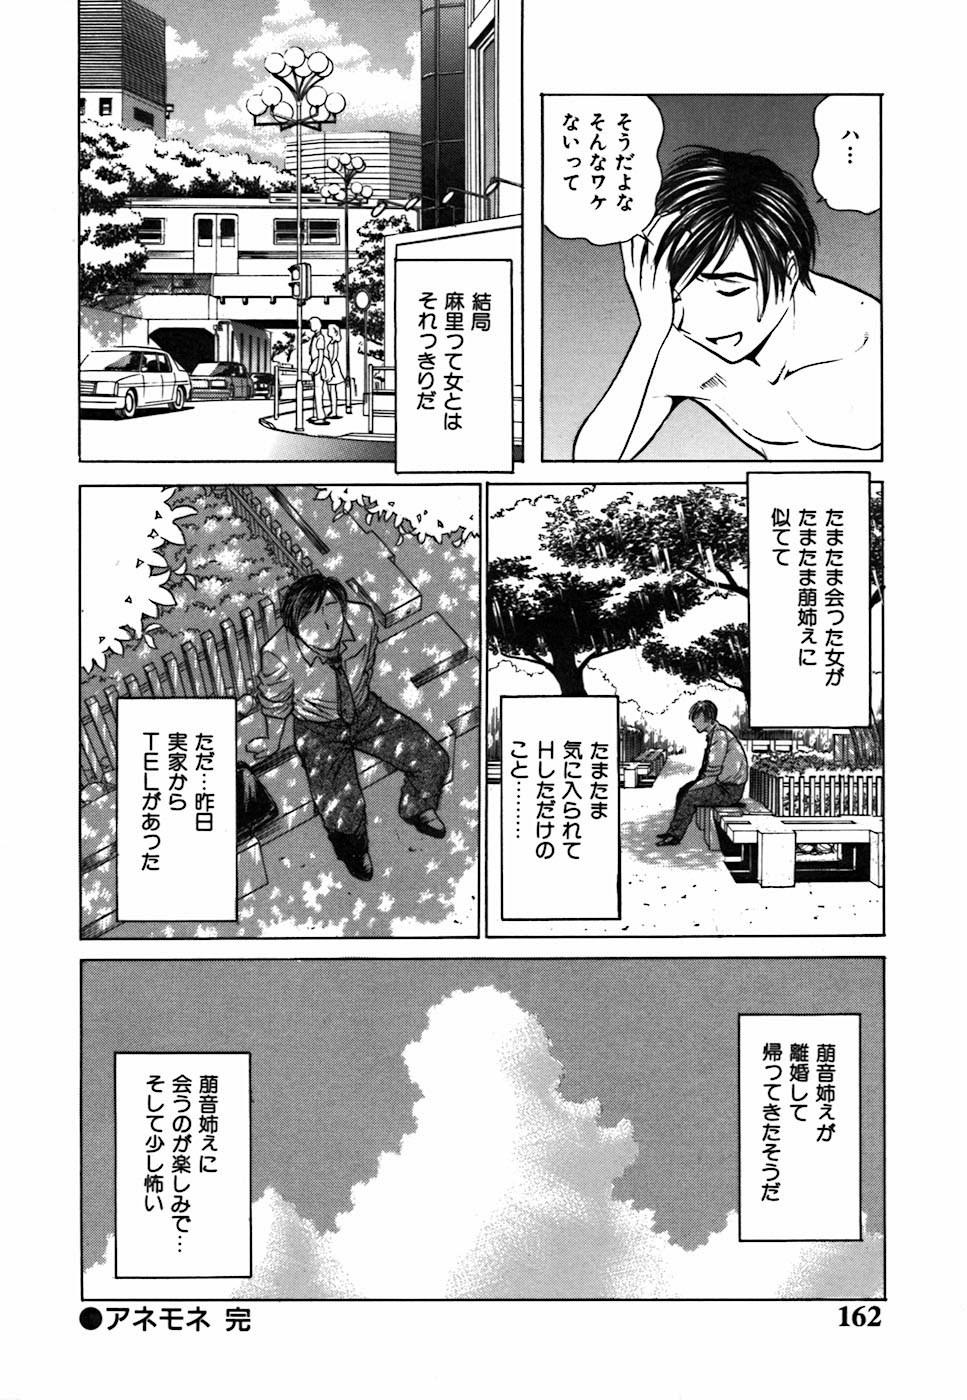 Kimi ga Nozomu Katachi | Appearance for which you hope 161